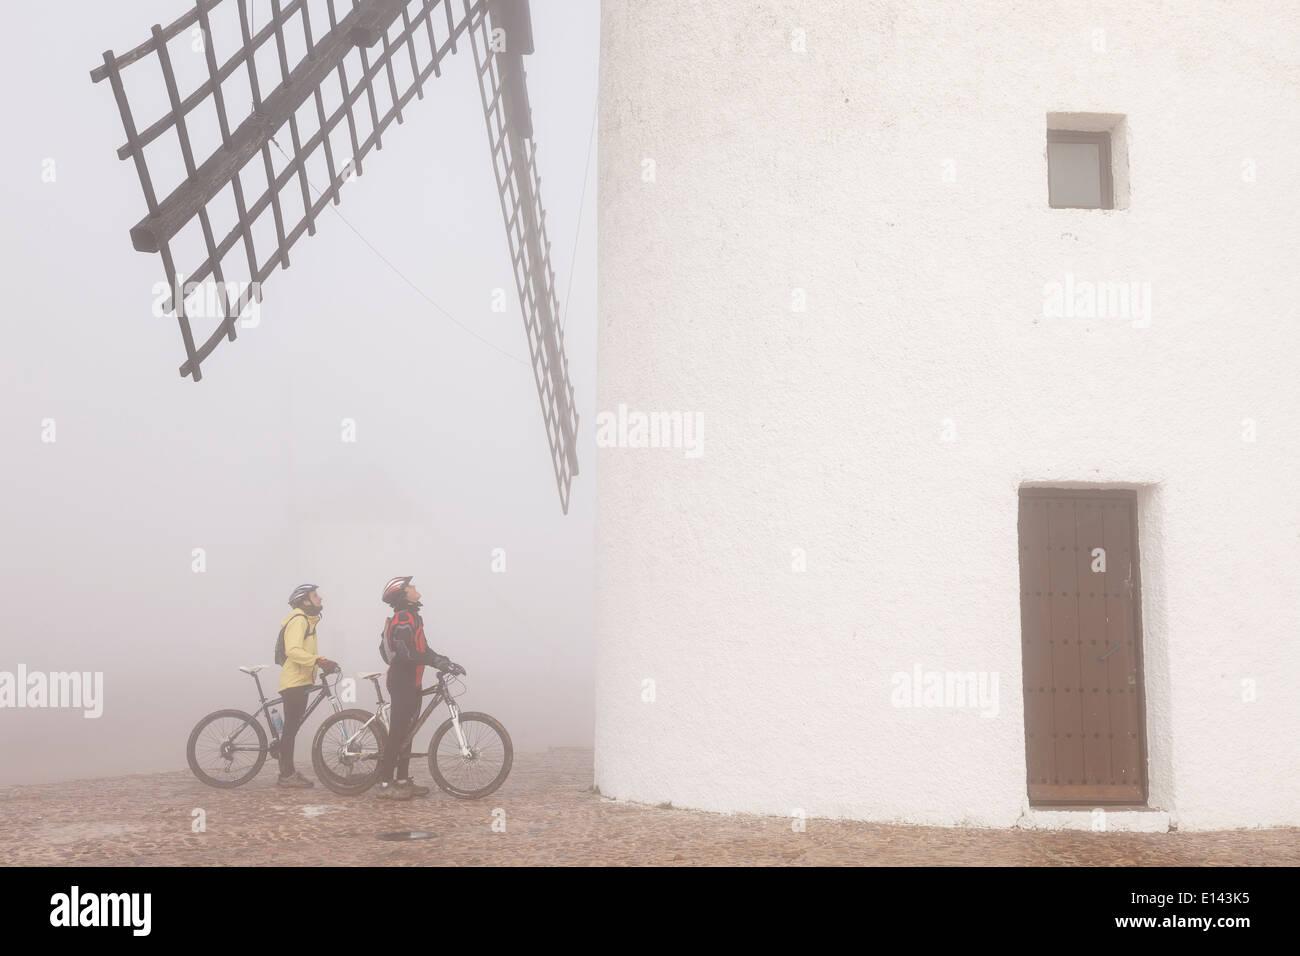 MIlls and bikers. Alcazar de San Juan. Ciudad Real. La Mancha. Spain. Europe - Stock Image